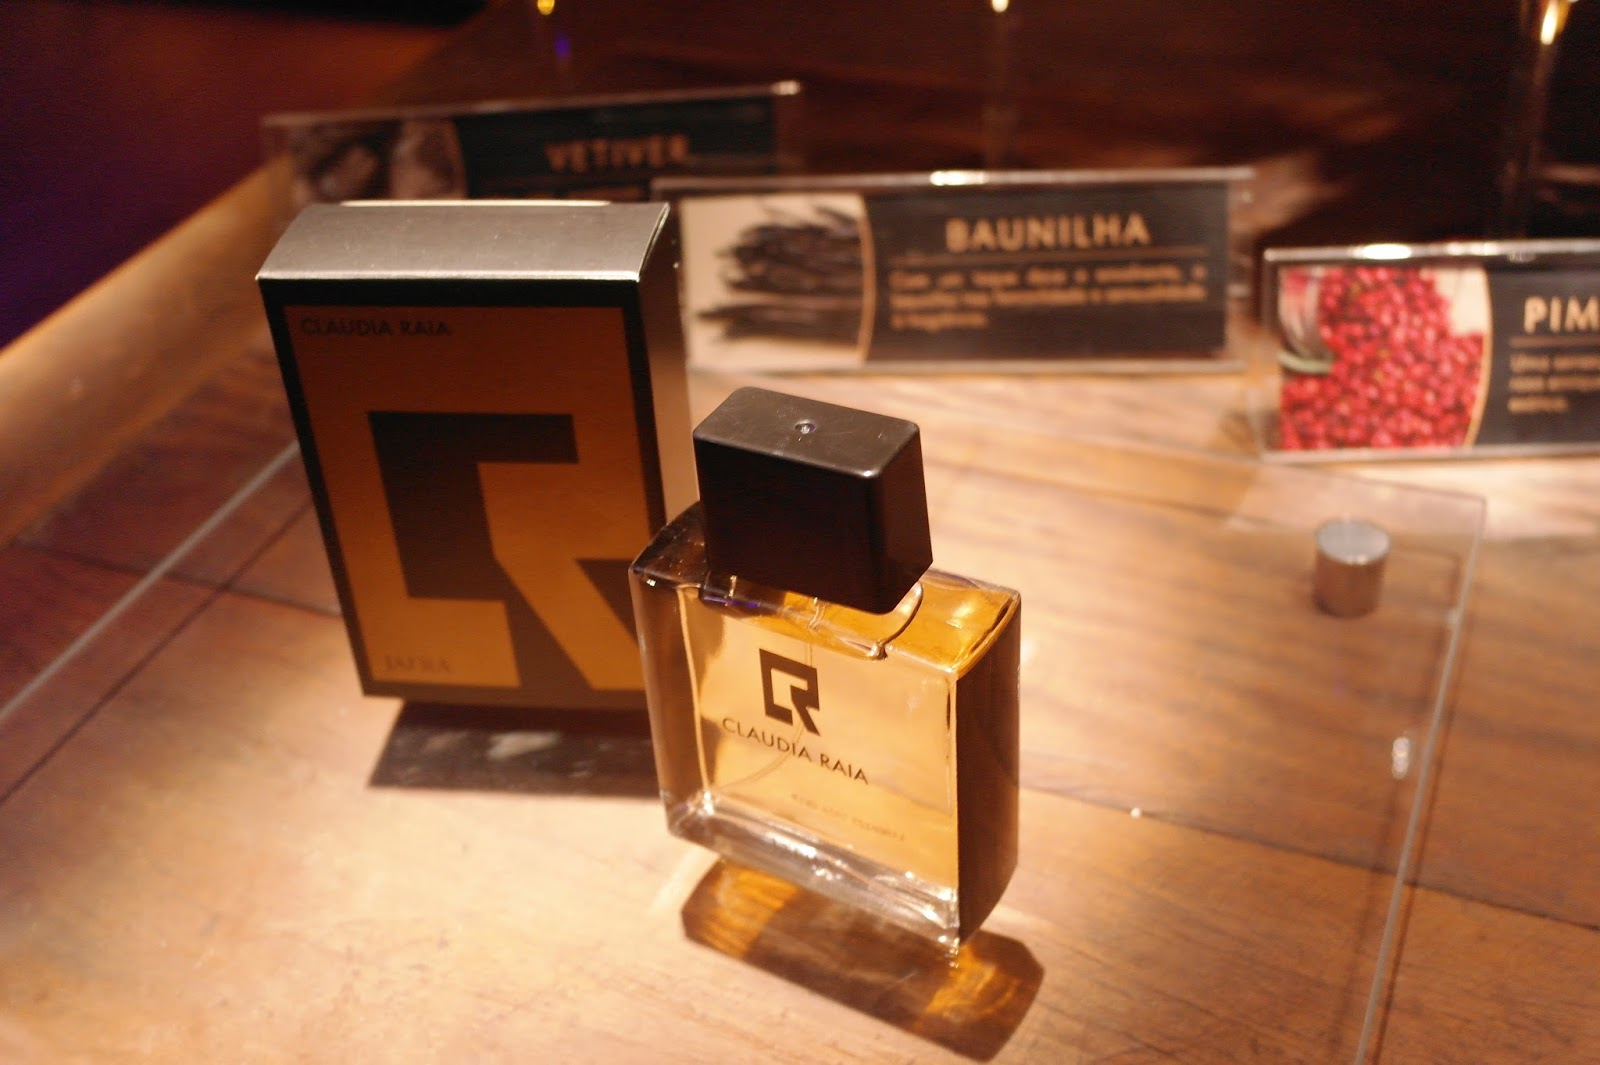 Claudia Raia e Jafra lança perfume SP vem conferir